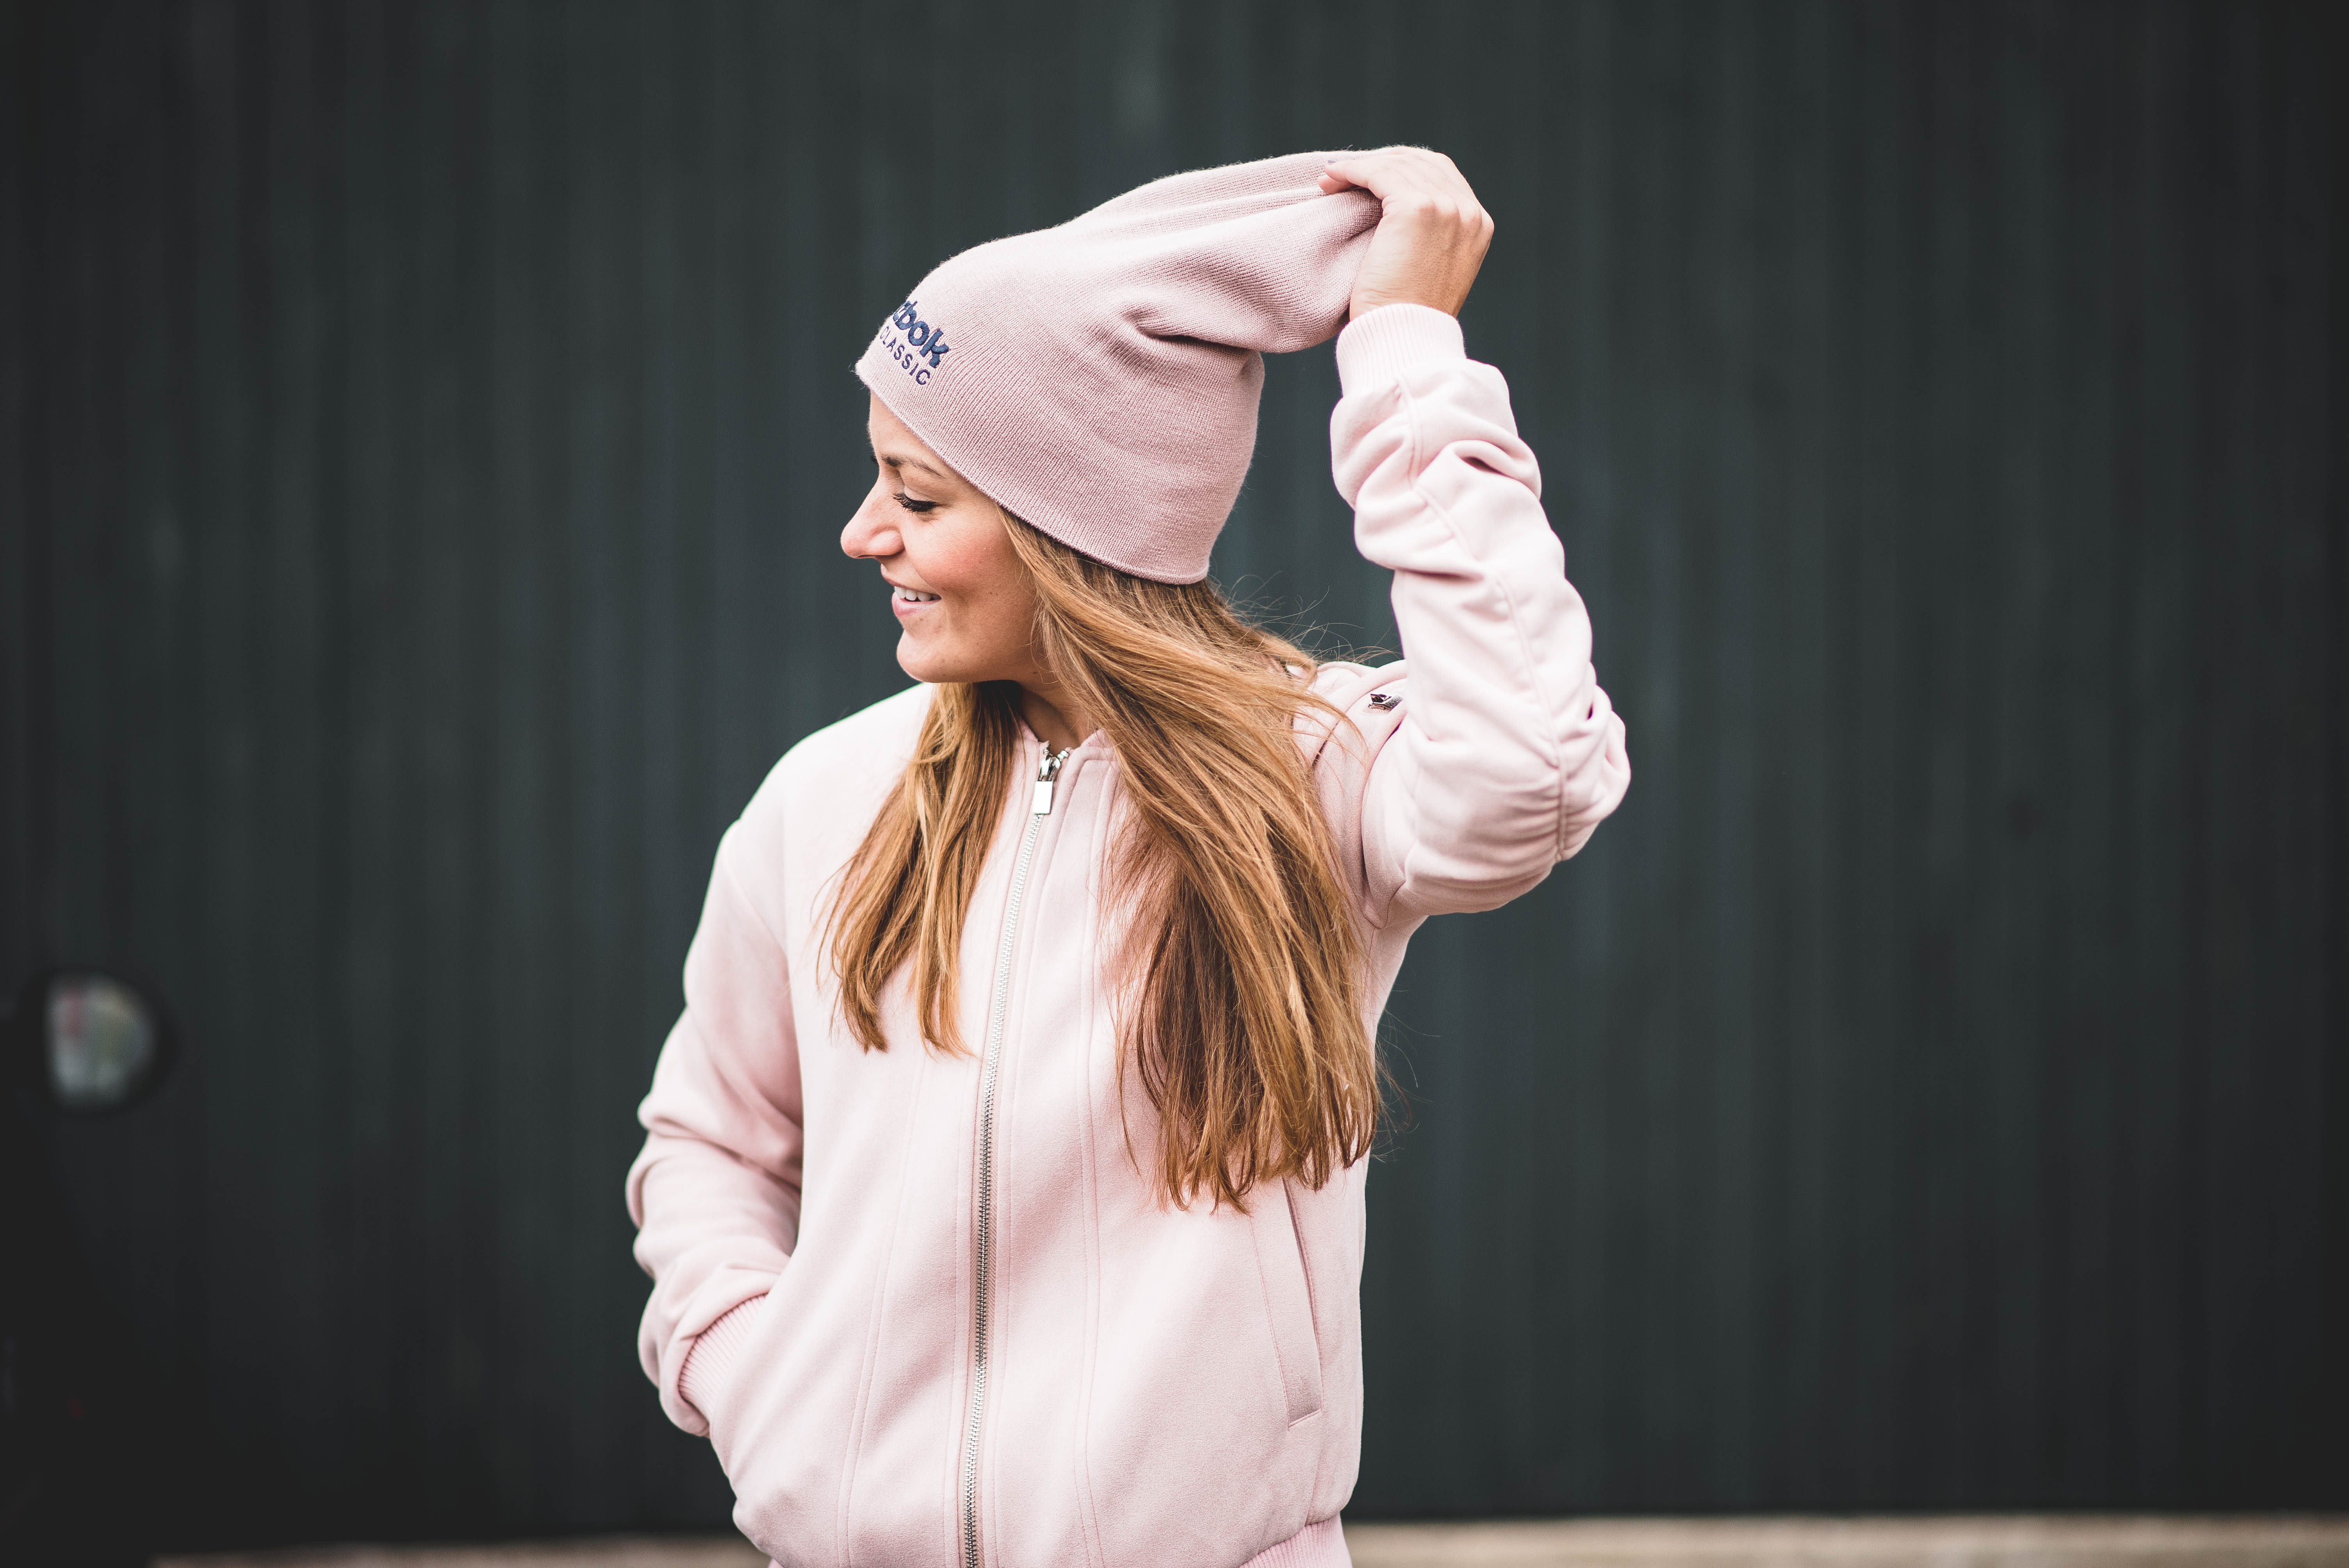 Defshop, outfit, wiw, wiwt, ootd, look, streetstyle, beanie, headphone, skullcandy, vero moda, spijkerbroek, jeans, nike, sneakers, beige, pink, roze, bomber, suede, bomberjack, blog, blogger, fashion, mode, fashionista